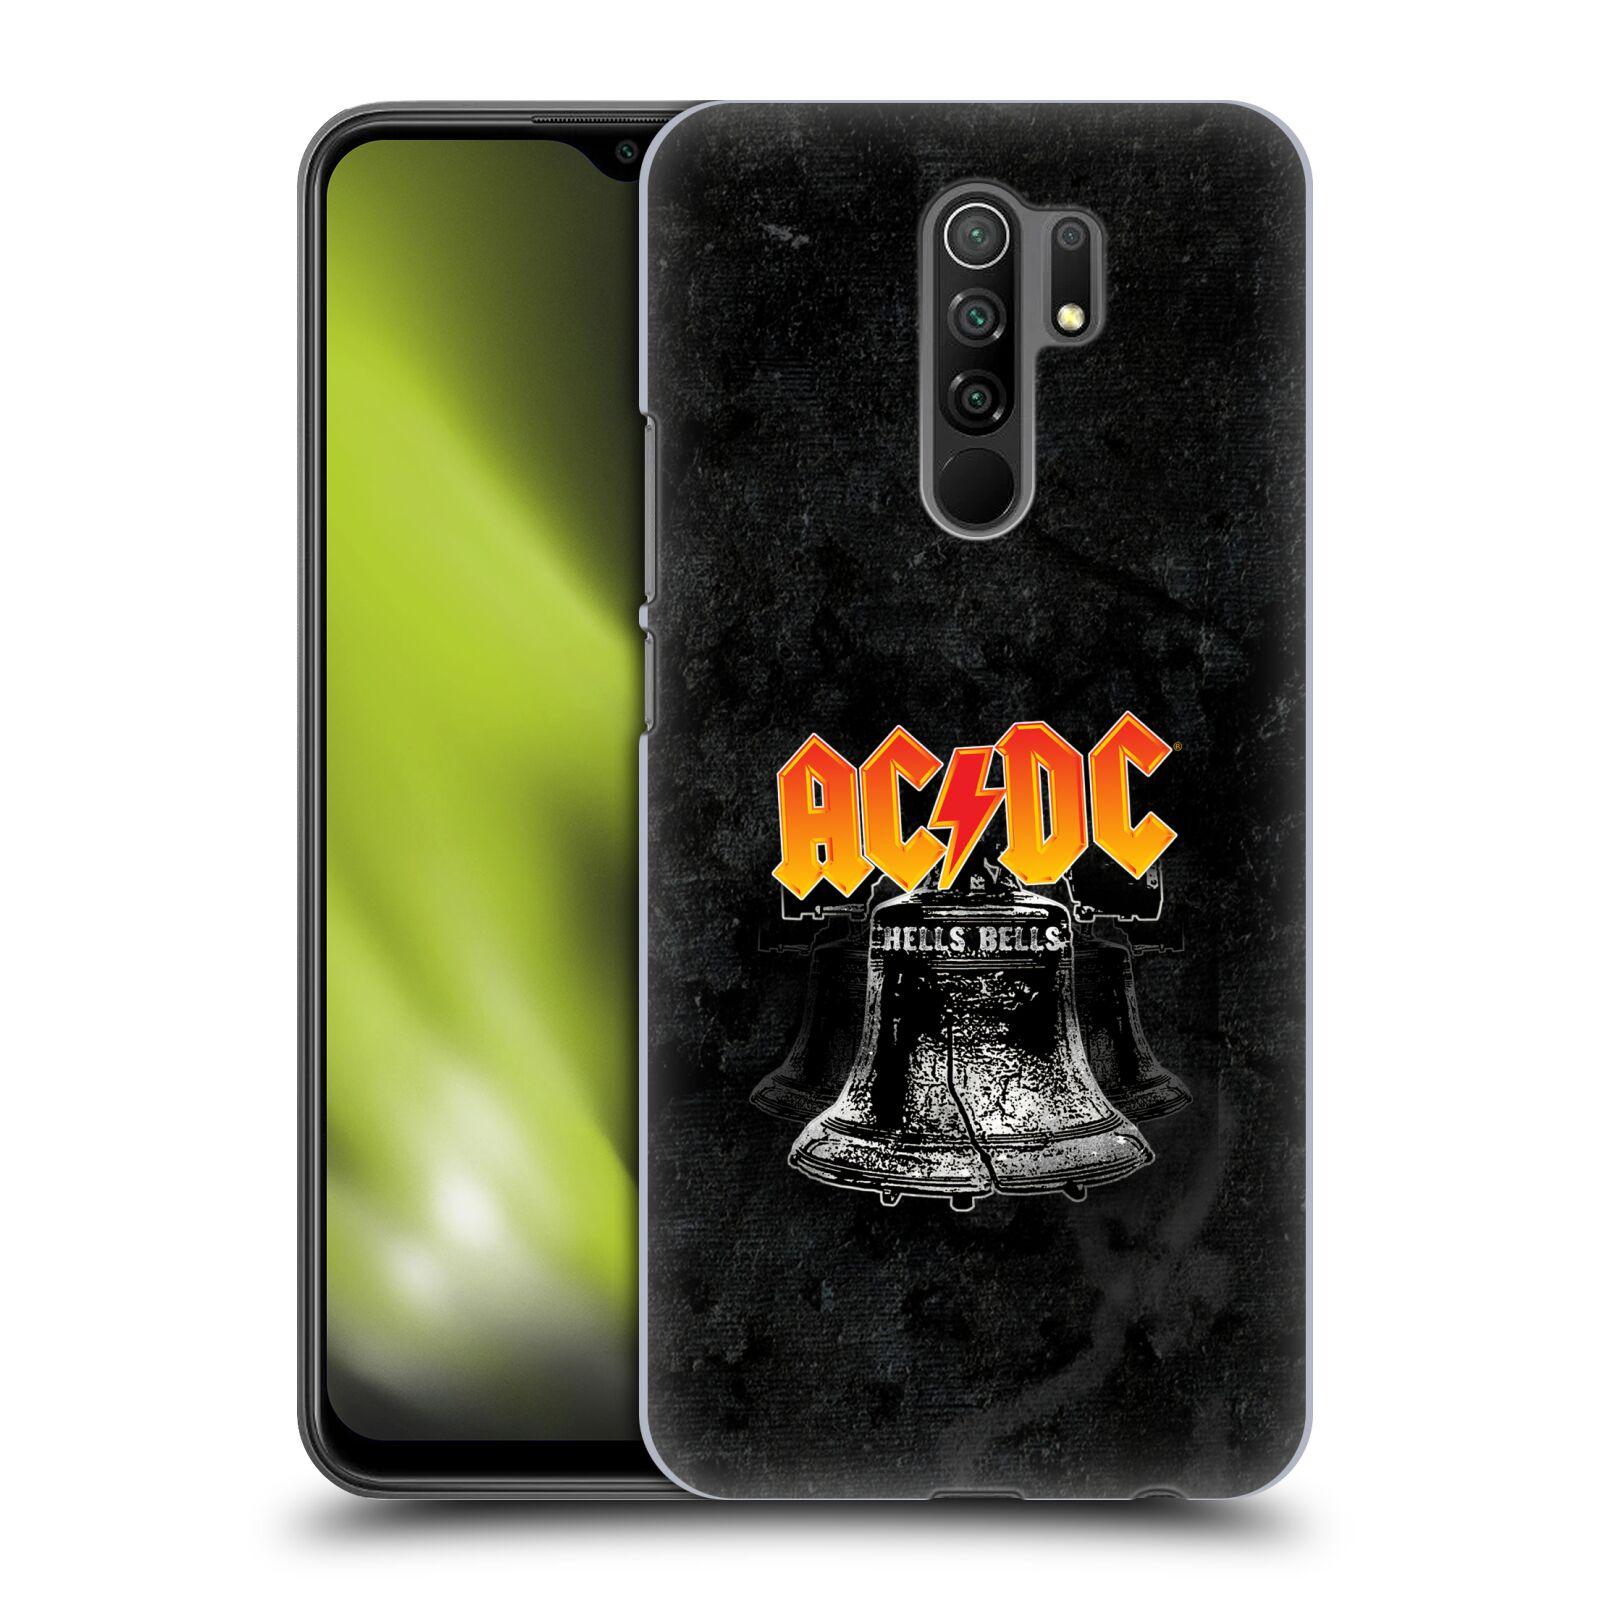 Plastové pouzdro na mobil Xiaomi Redmi 9 - Head Case - AC/DC Hells Bells